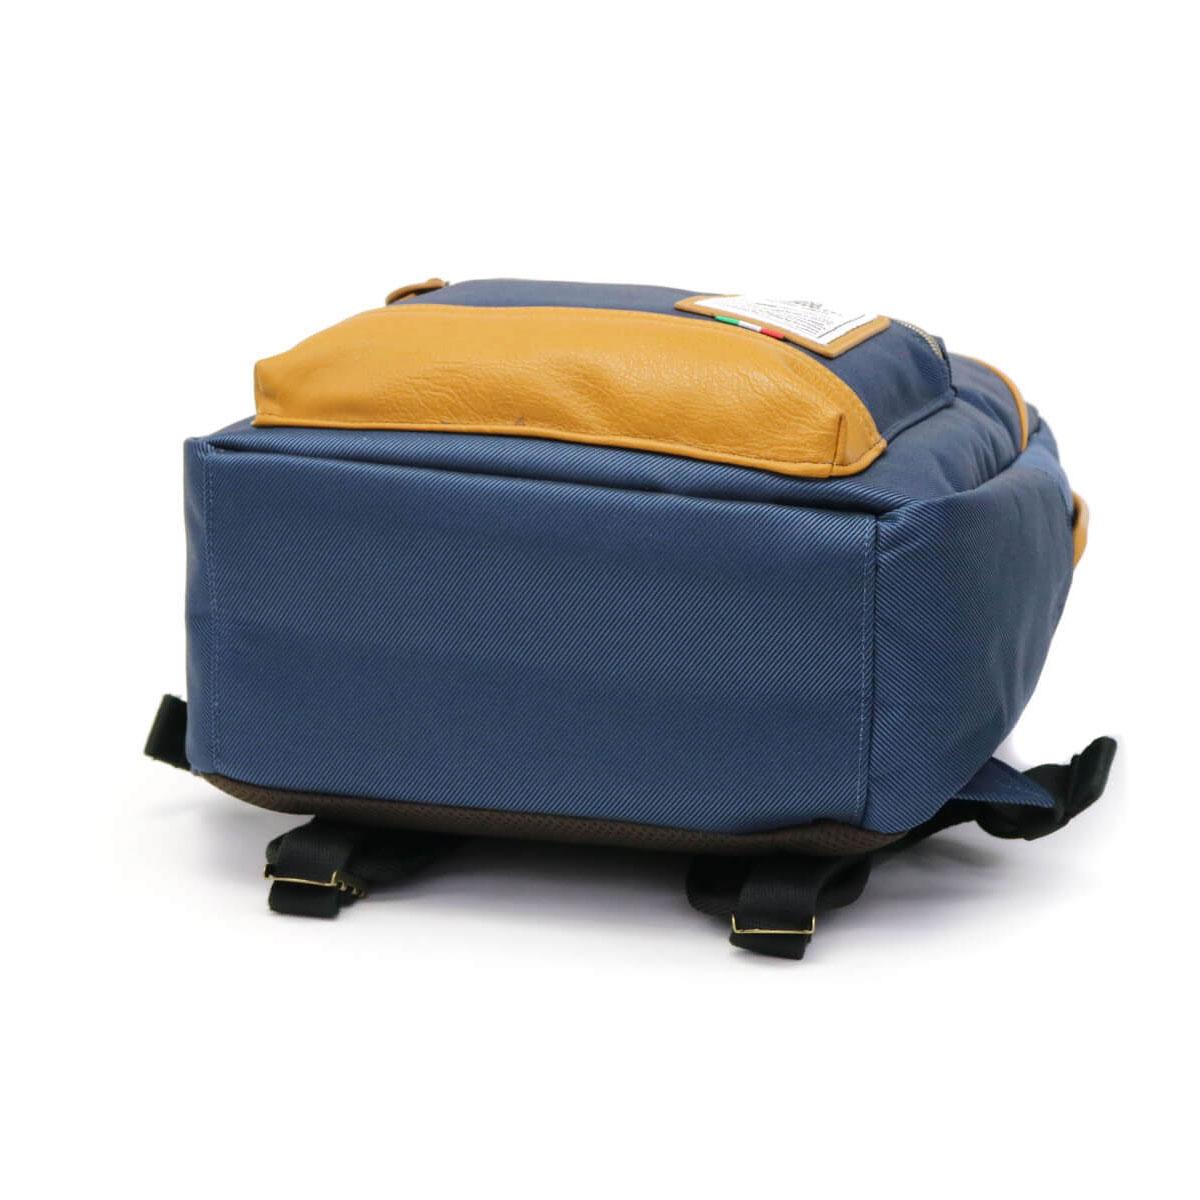 Bianchi backpack A4 DIBASE waterproof commuter men's ladies NBTC - 05